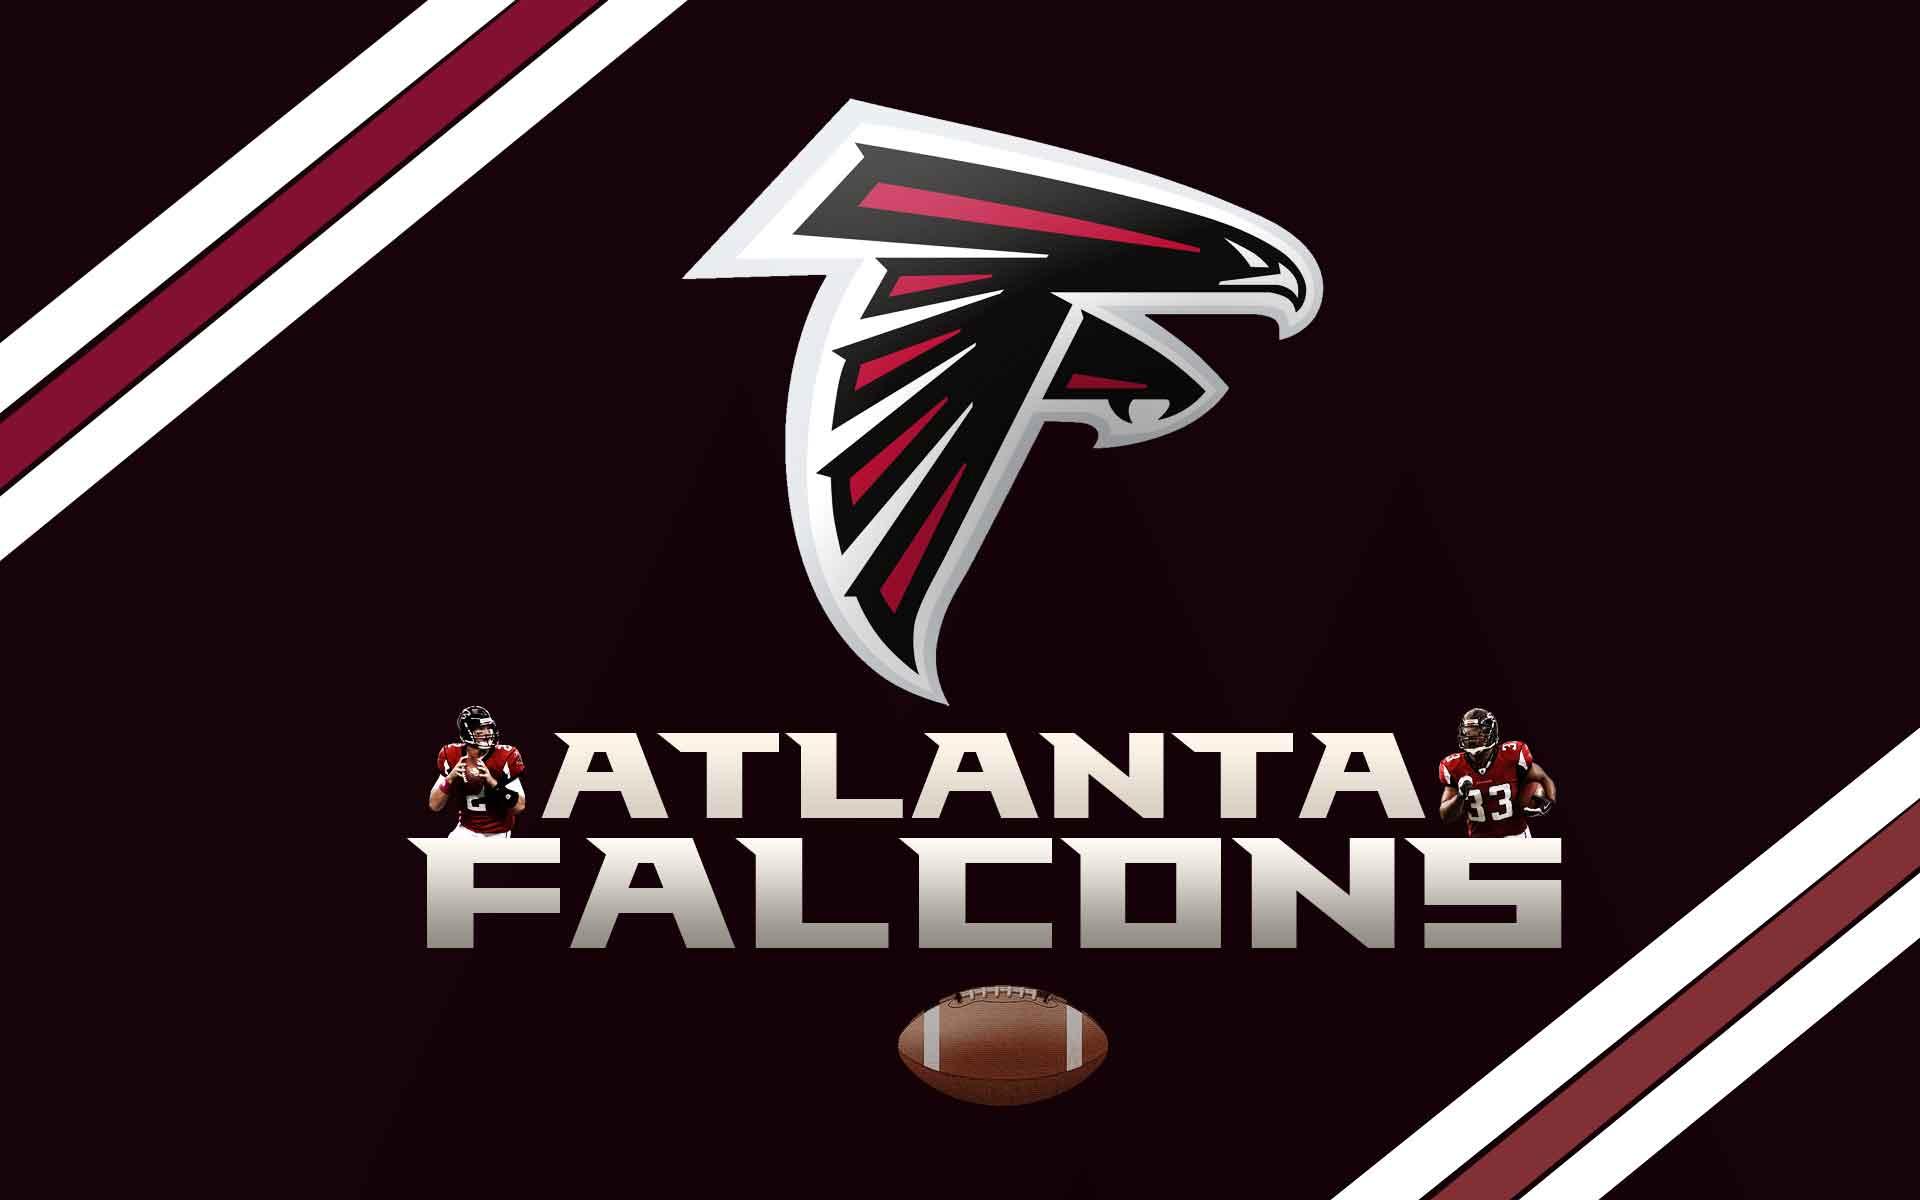 Images Of The Atlanta Falcons Football Logos: Atlanta Falcons Symbol